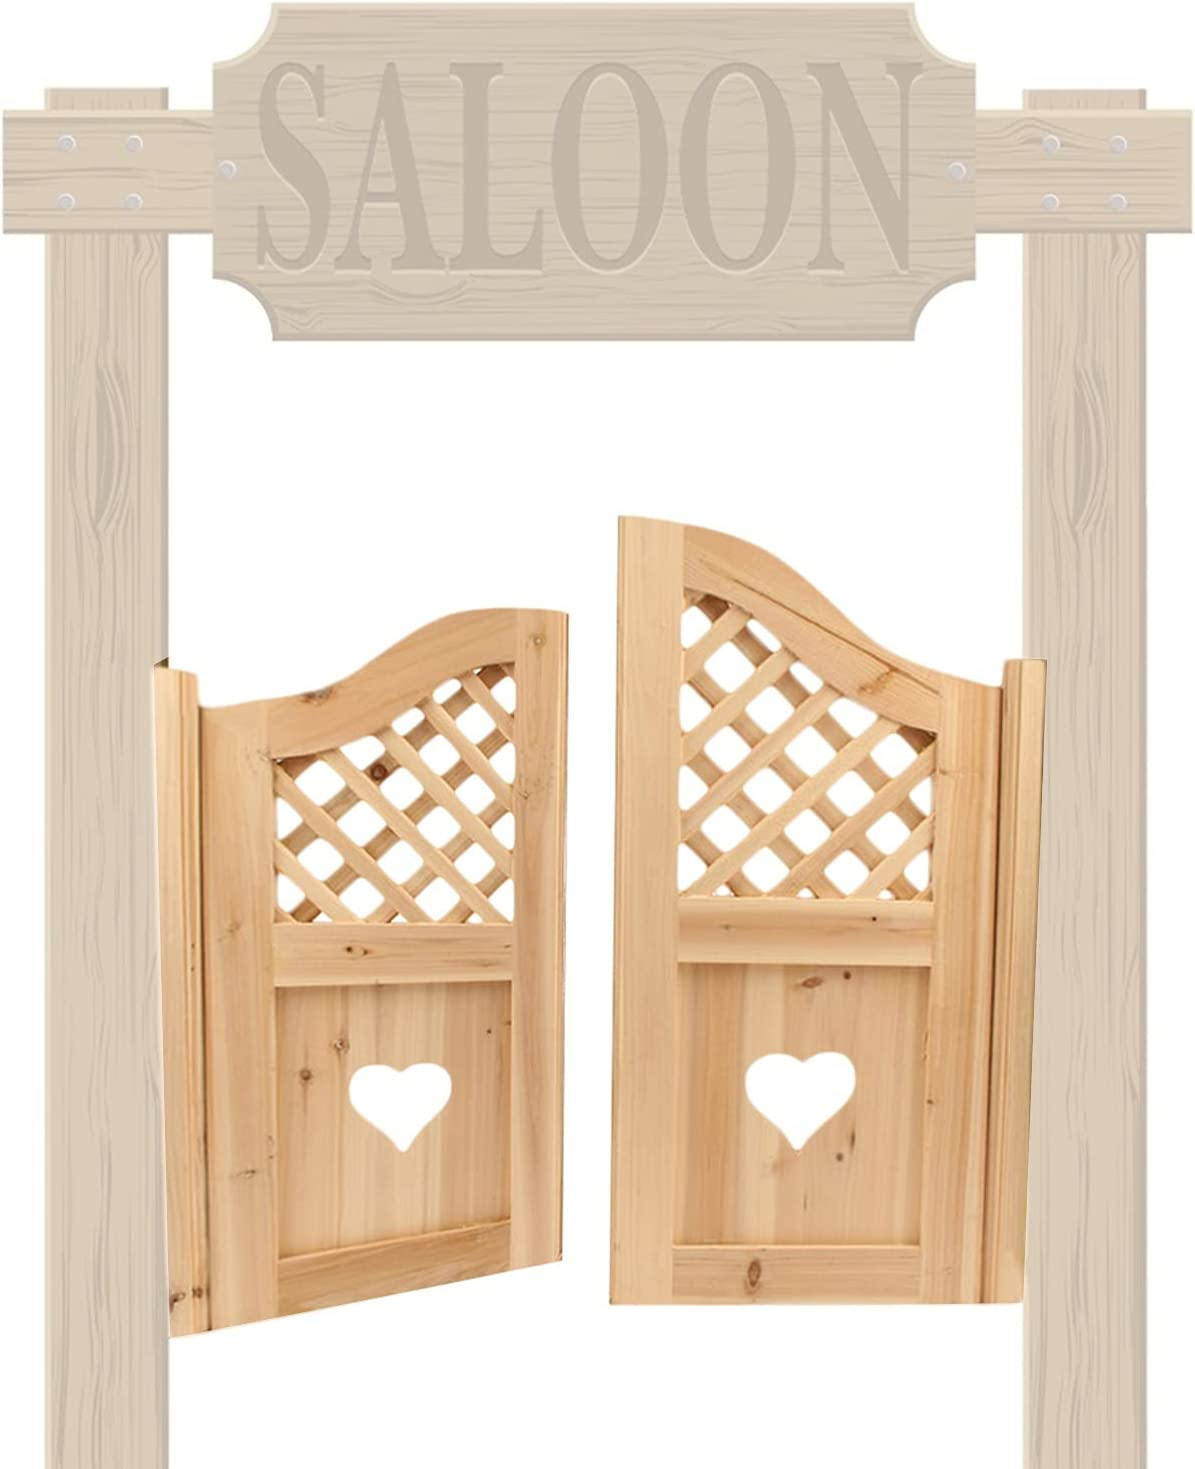 CAIJUN Salon Sales of SALE items from new works Bar Entrance Swinging Wooden Arlington Mall Partitio Doors Indoor